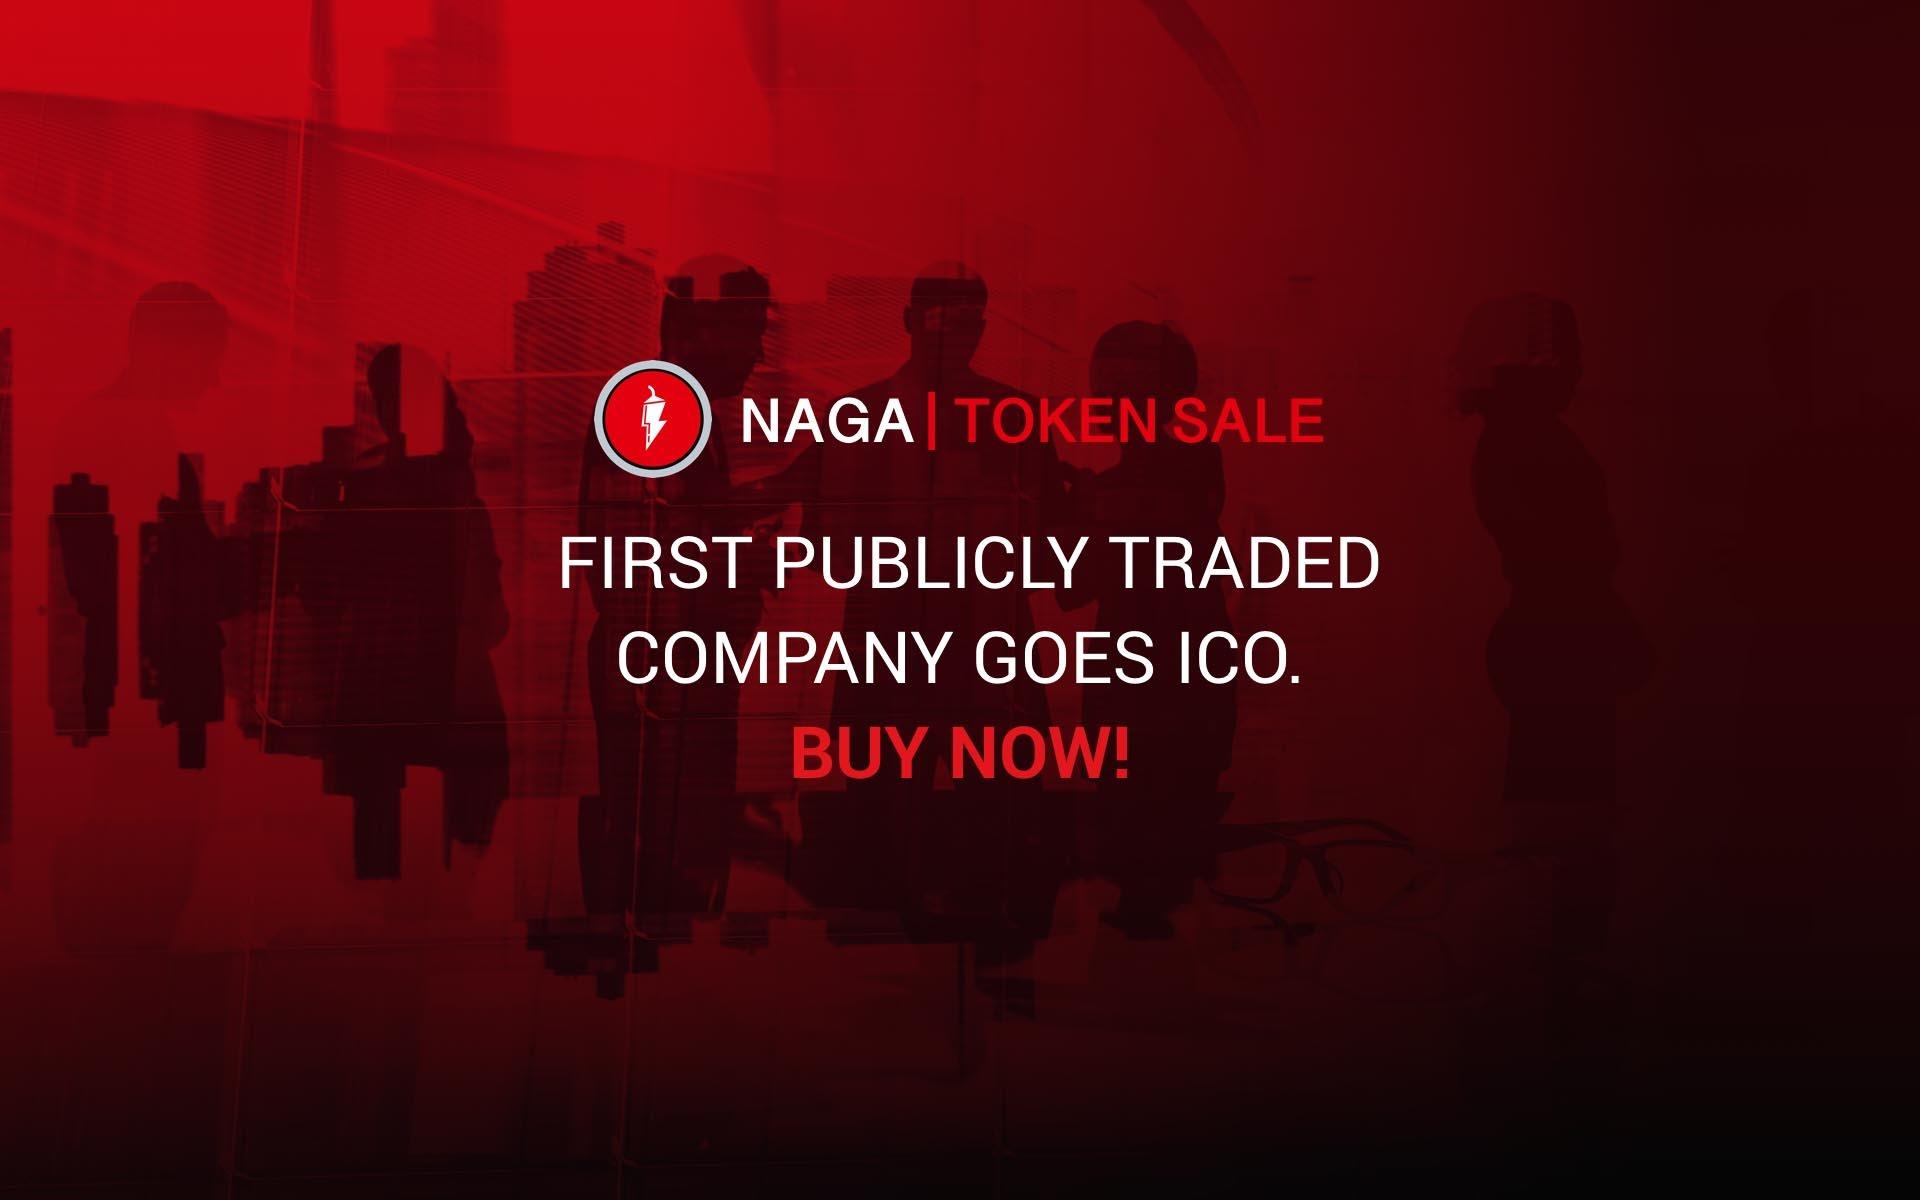 German FinTech Company NAGA Group to Launch Token Pre-Sale Today